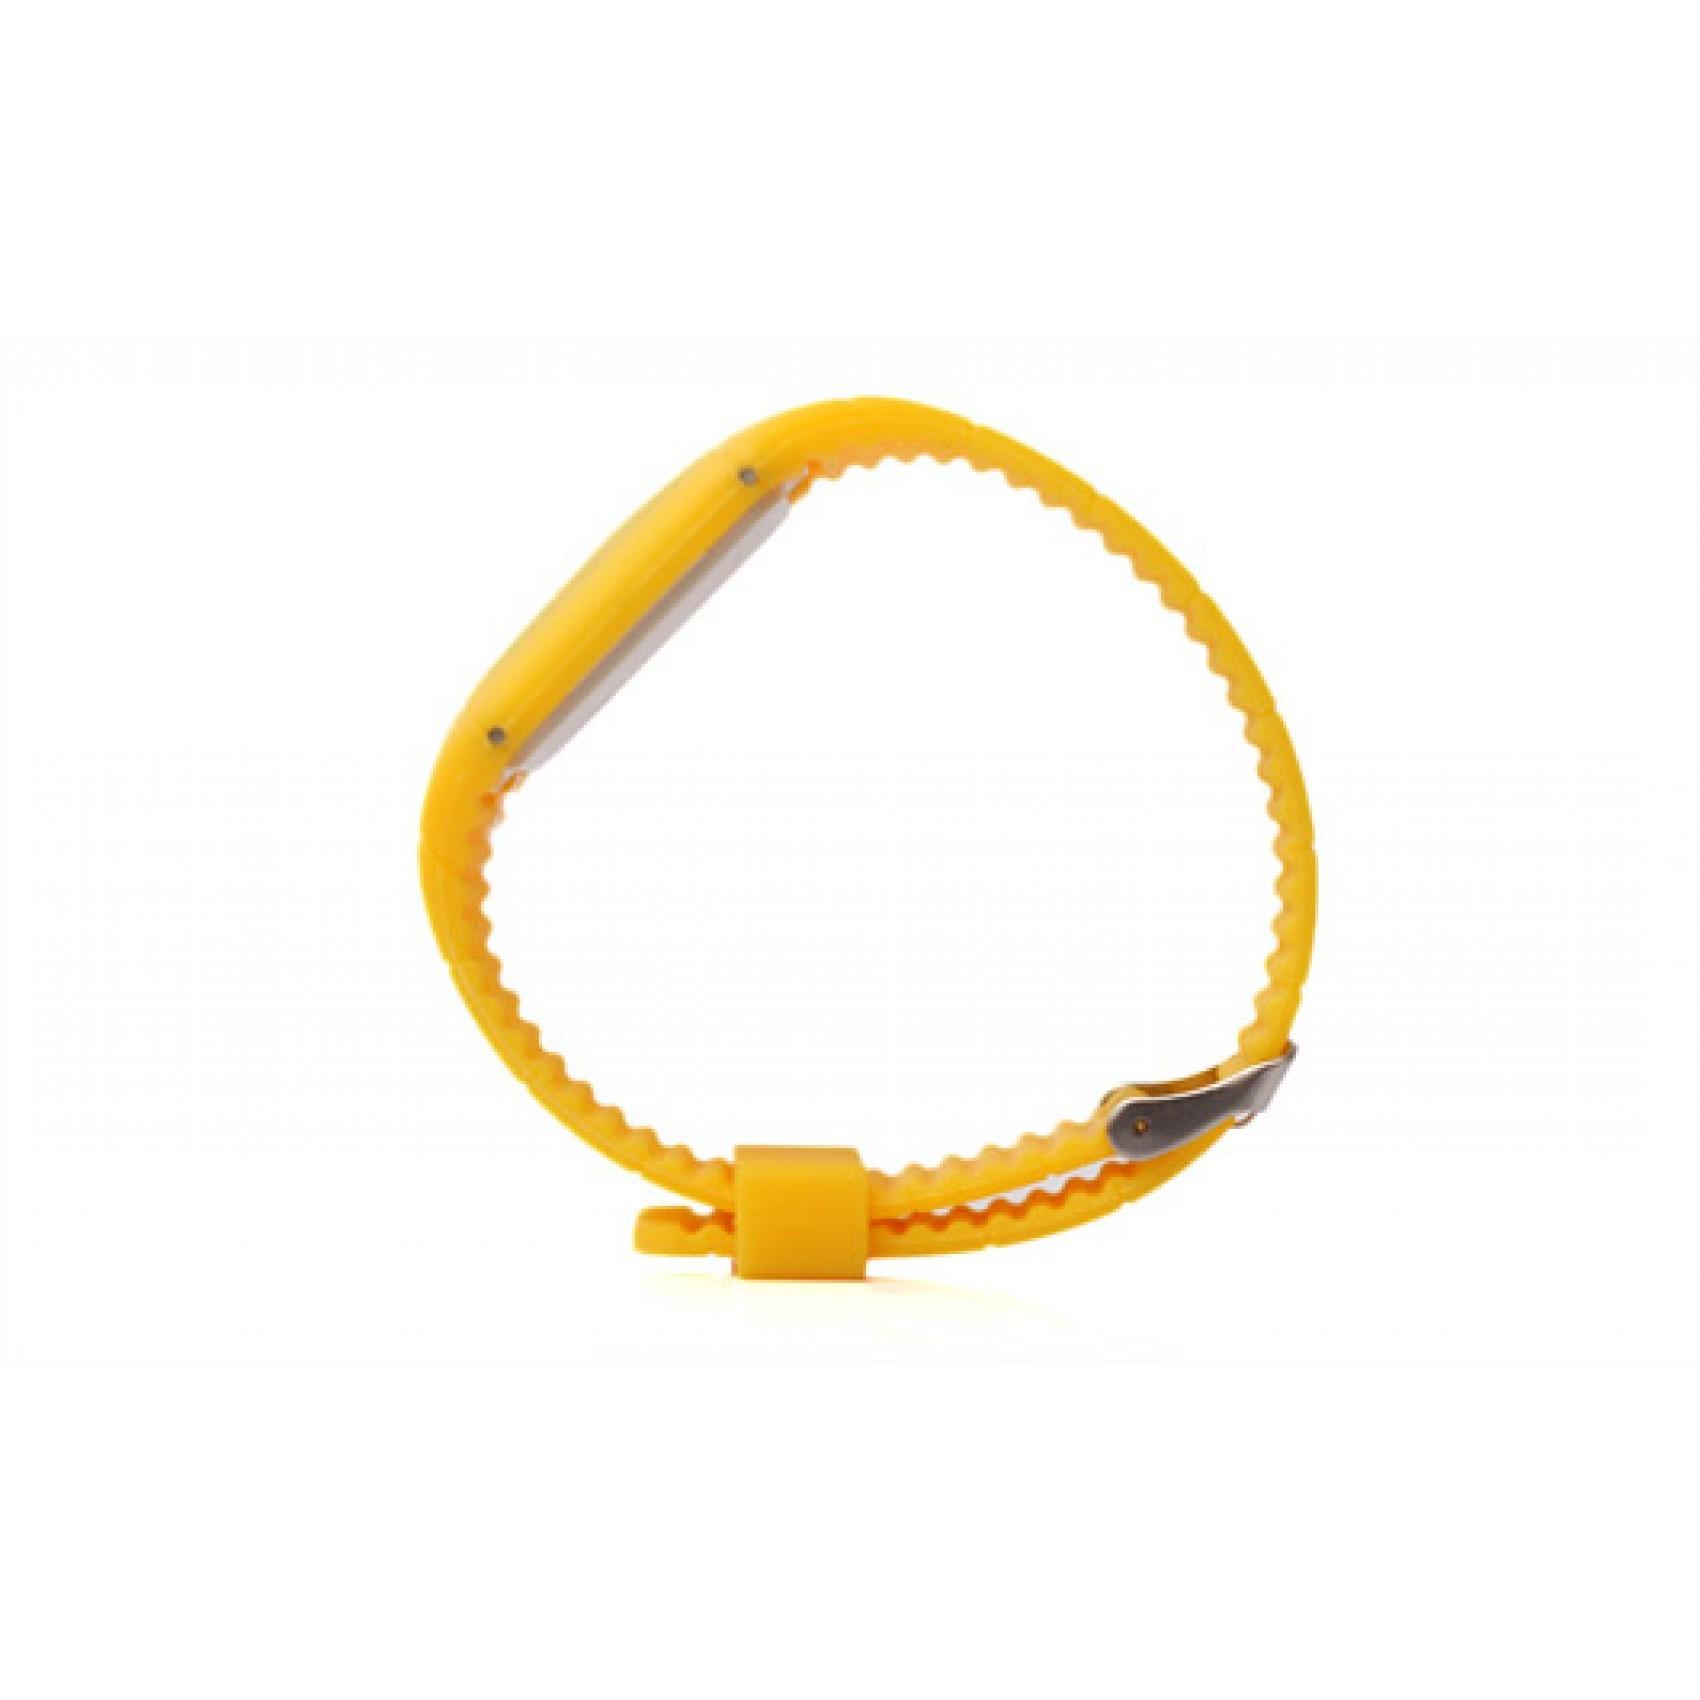 Touch Screen Watch - Yellow (LGXXX00001XXX-0001578)